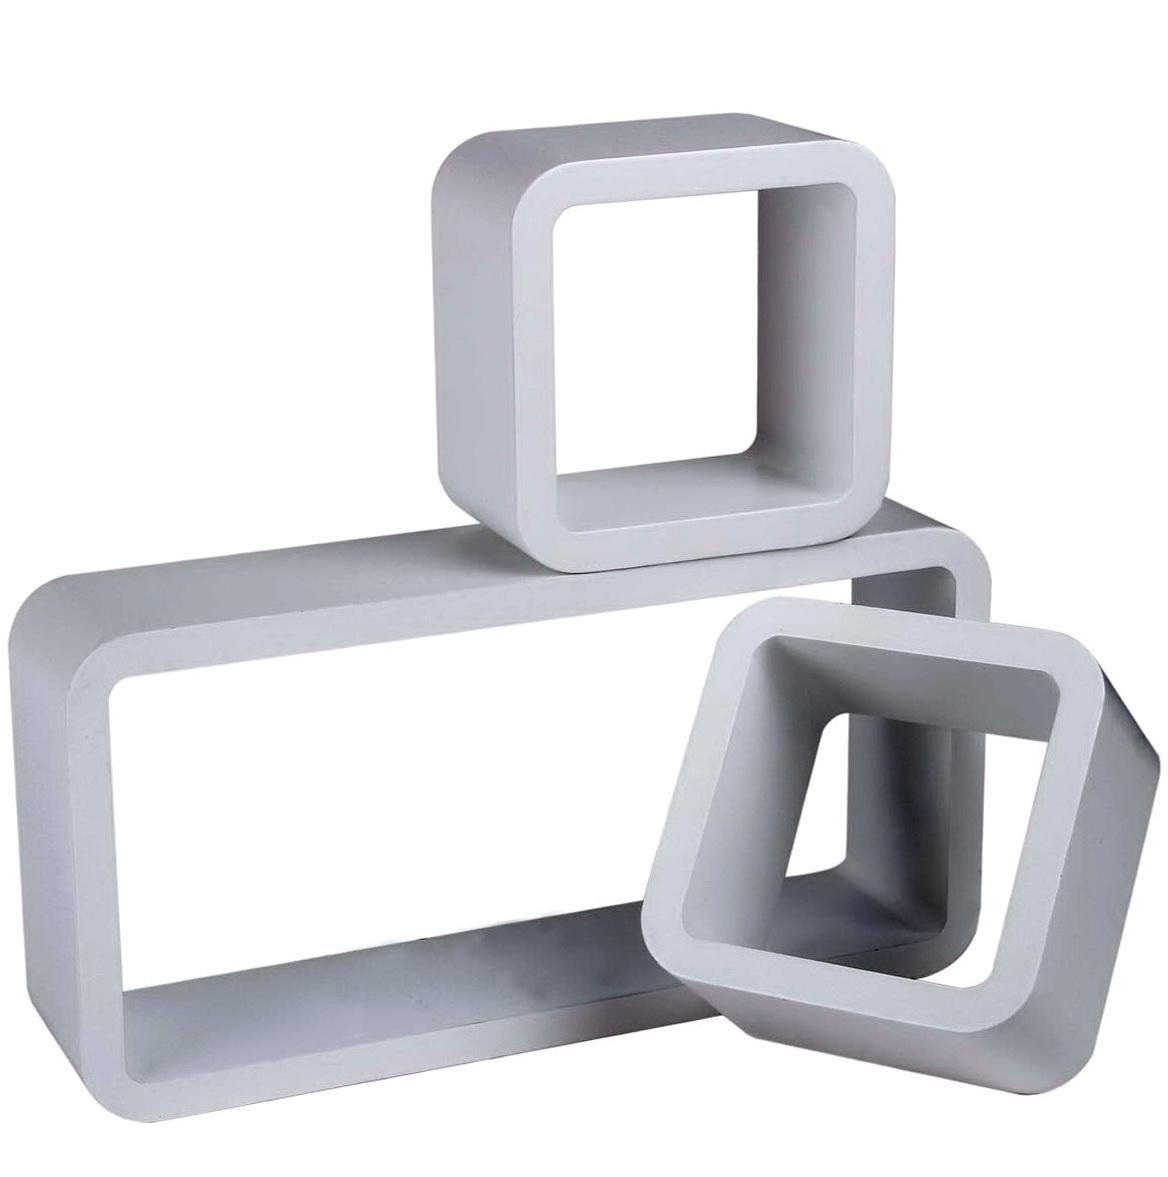 Small Cube Wall Shelves